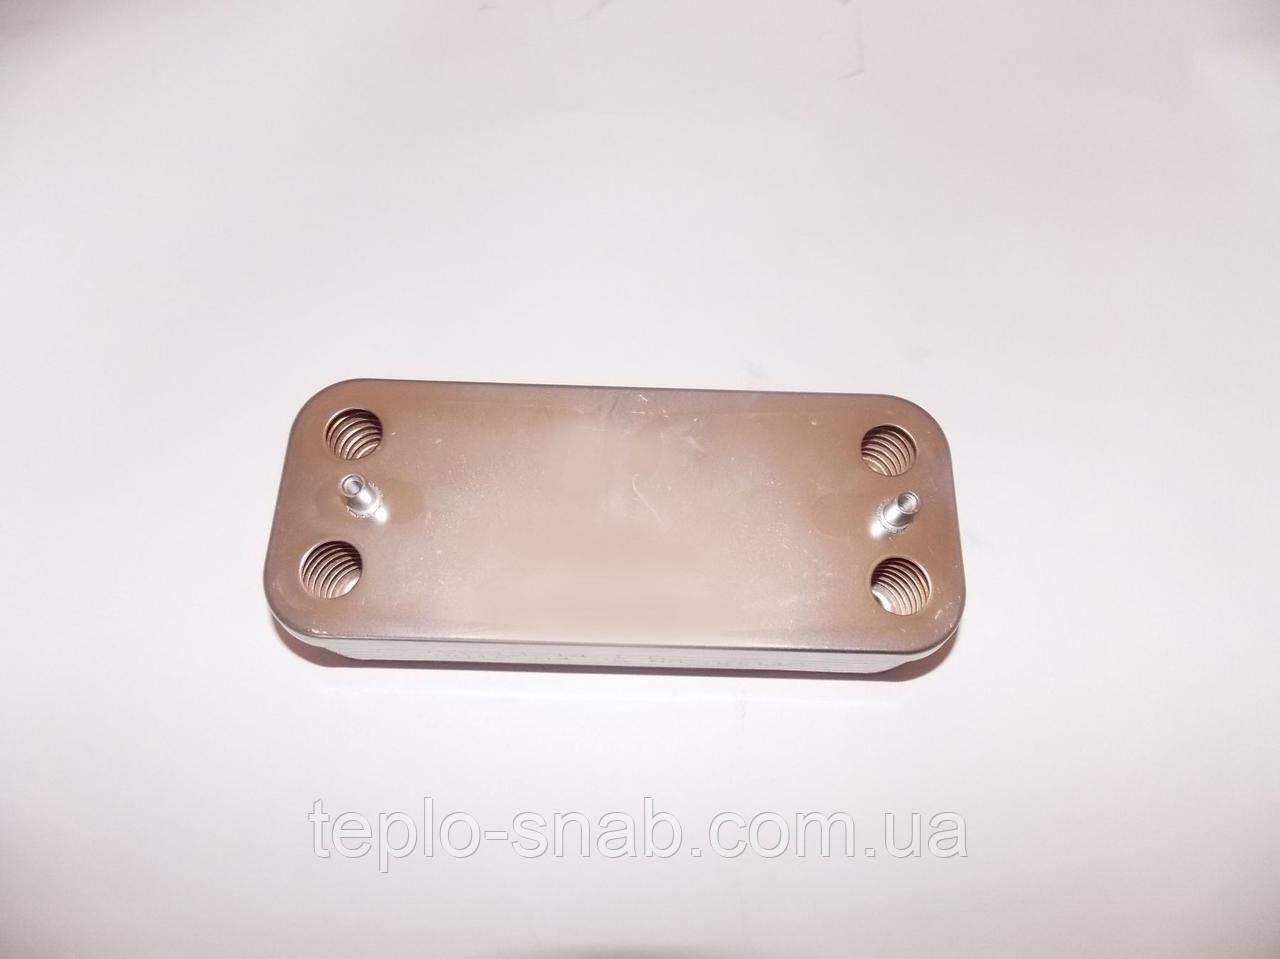 Вторинний теплообмінник Zoom Master BF/Expert BF 18-24 kw (FUGAS), Solly Primer, Grandini D324 - B2 10 пл. Aa10110001